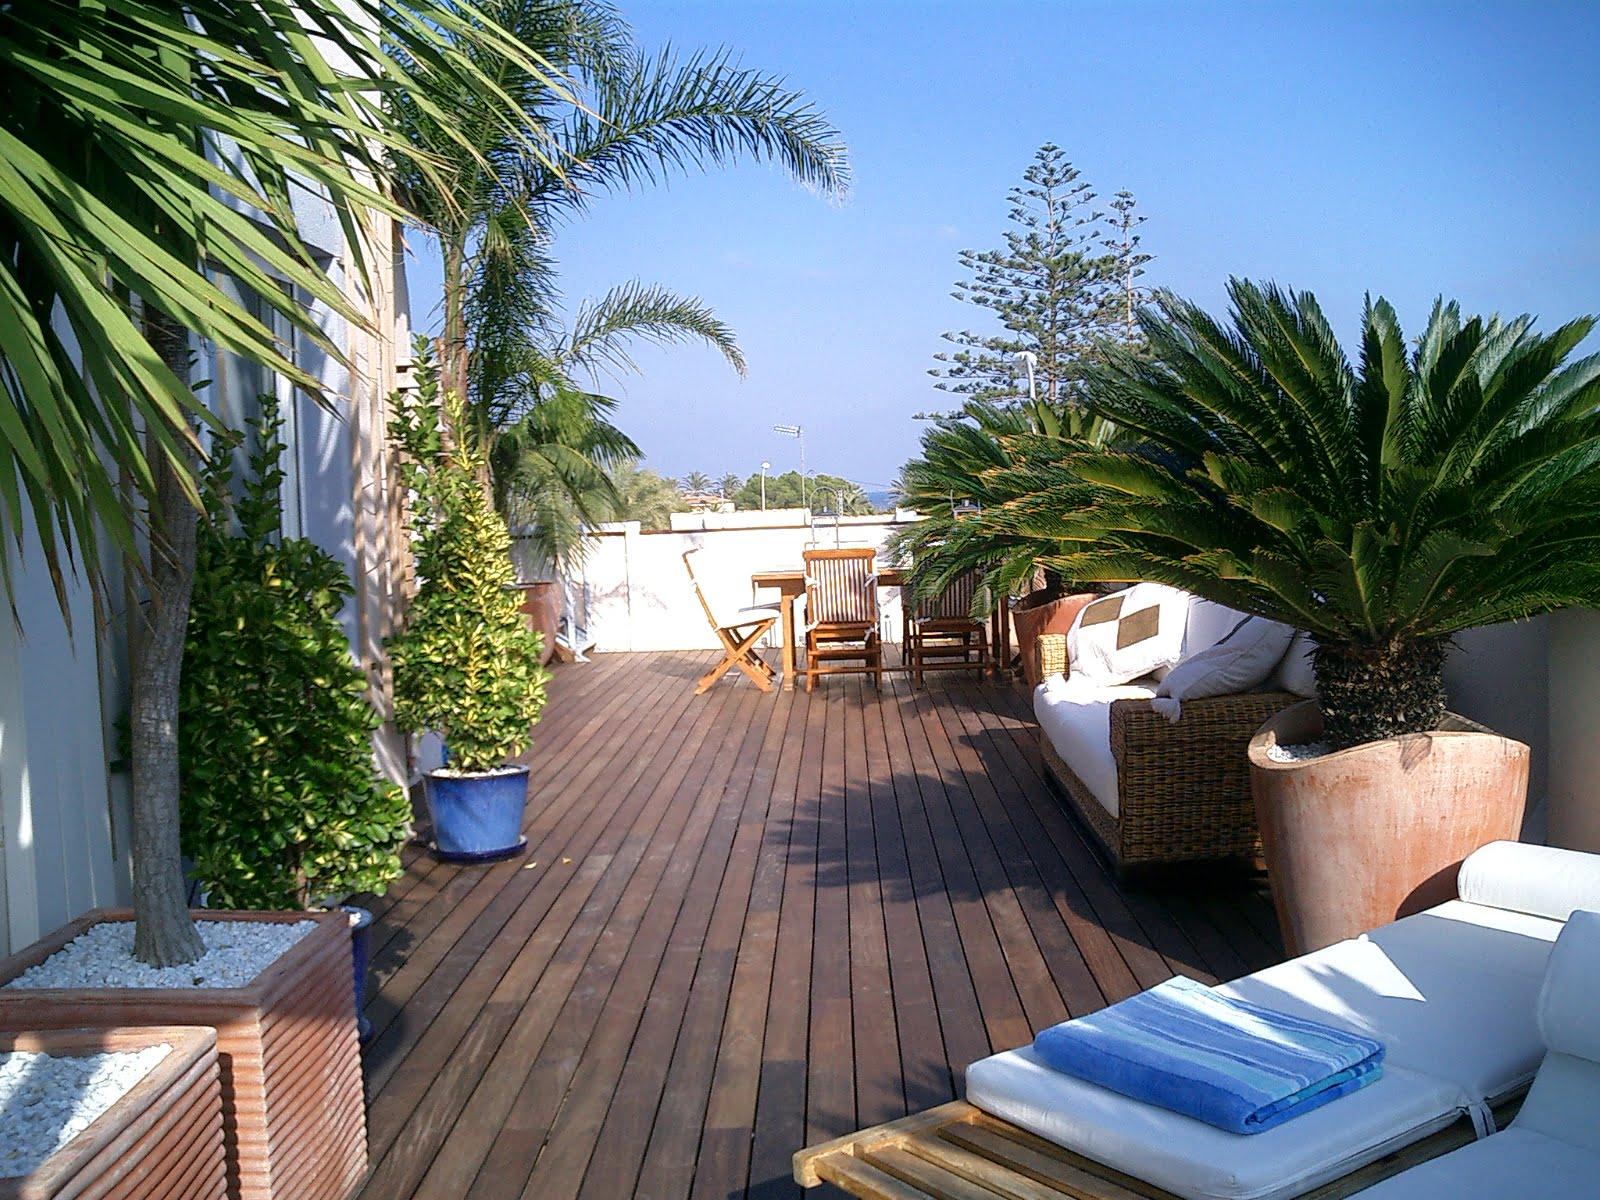 Terraza de chalet vacation villas j x - Terrazas bonitas ...